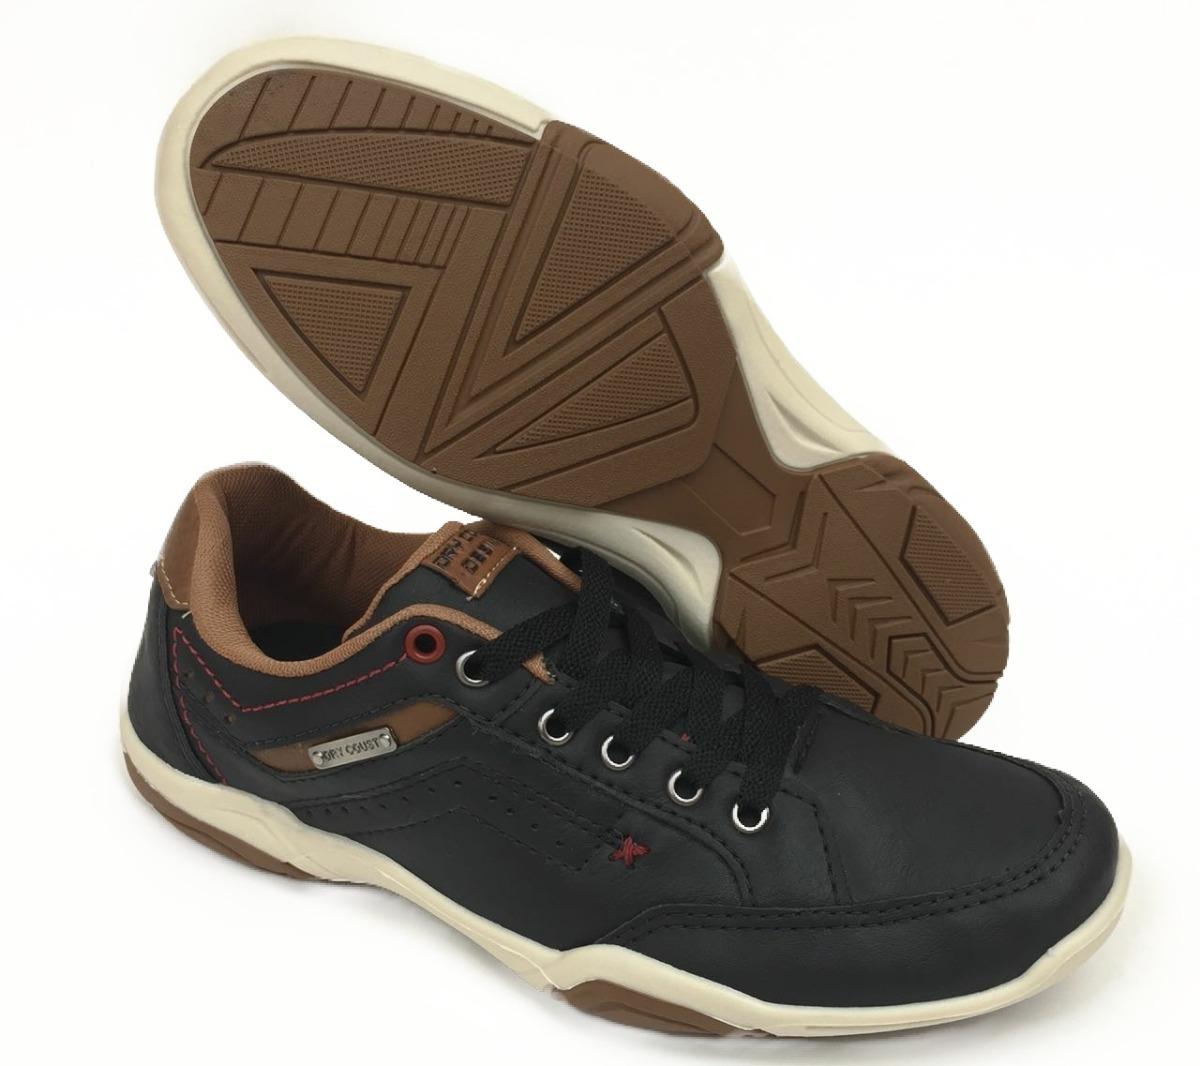 29f60a5537c tenis sapatenis sapato coust original masculino lançamento. Carregando zoom.